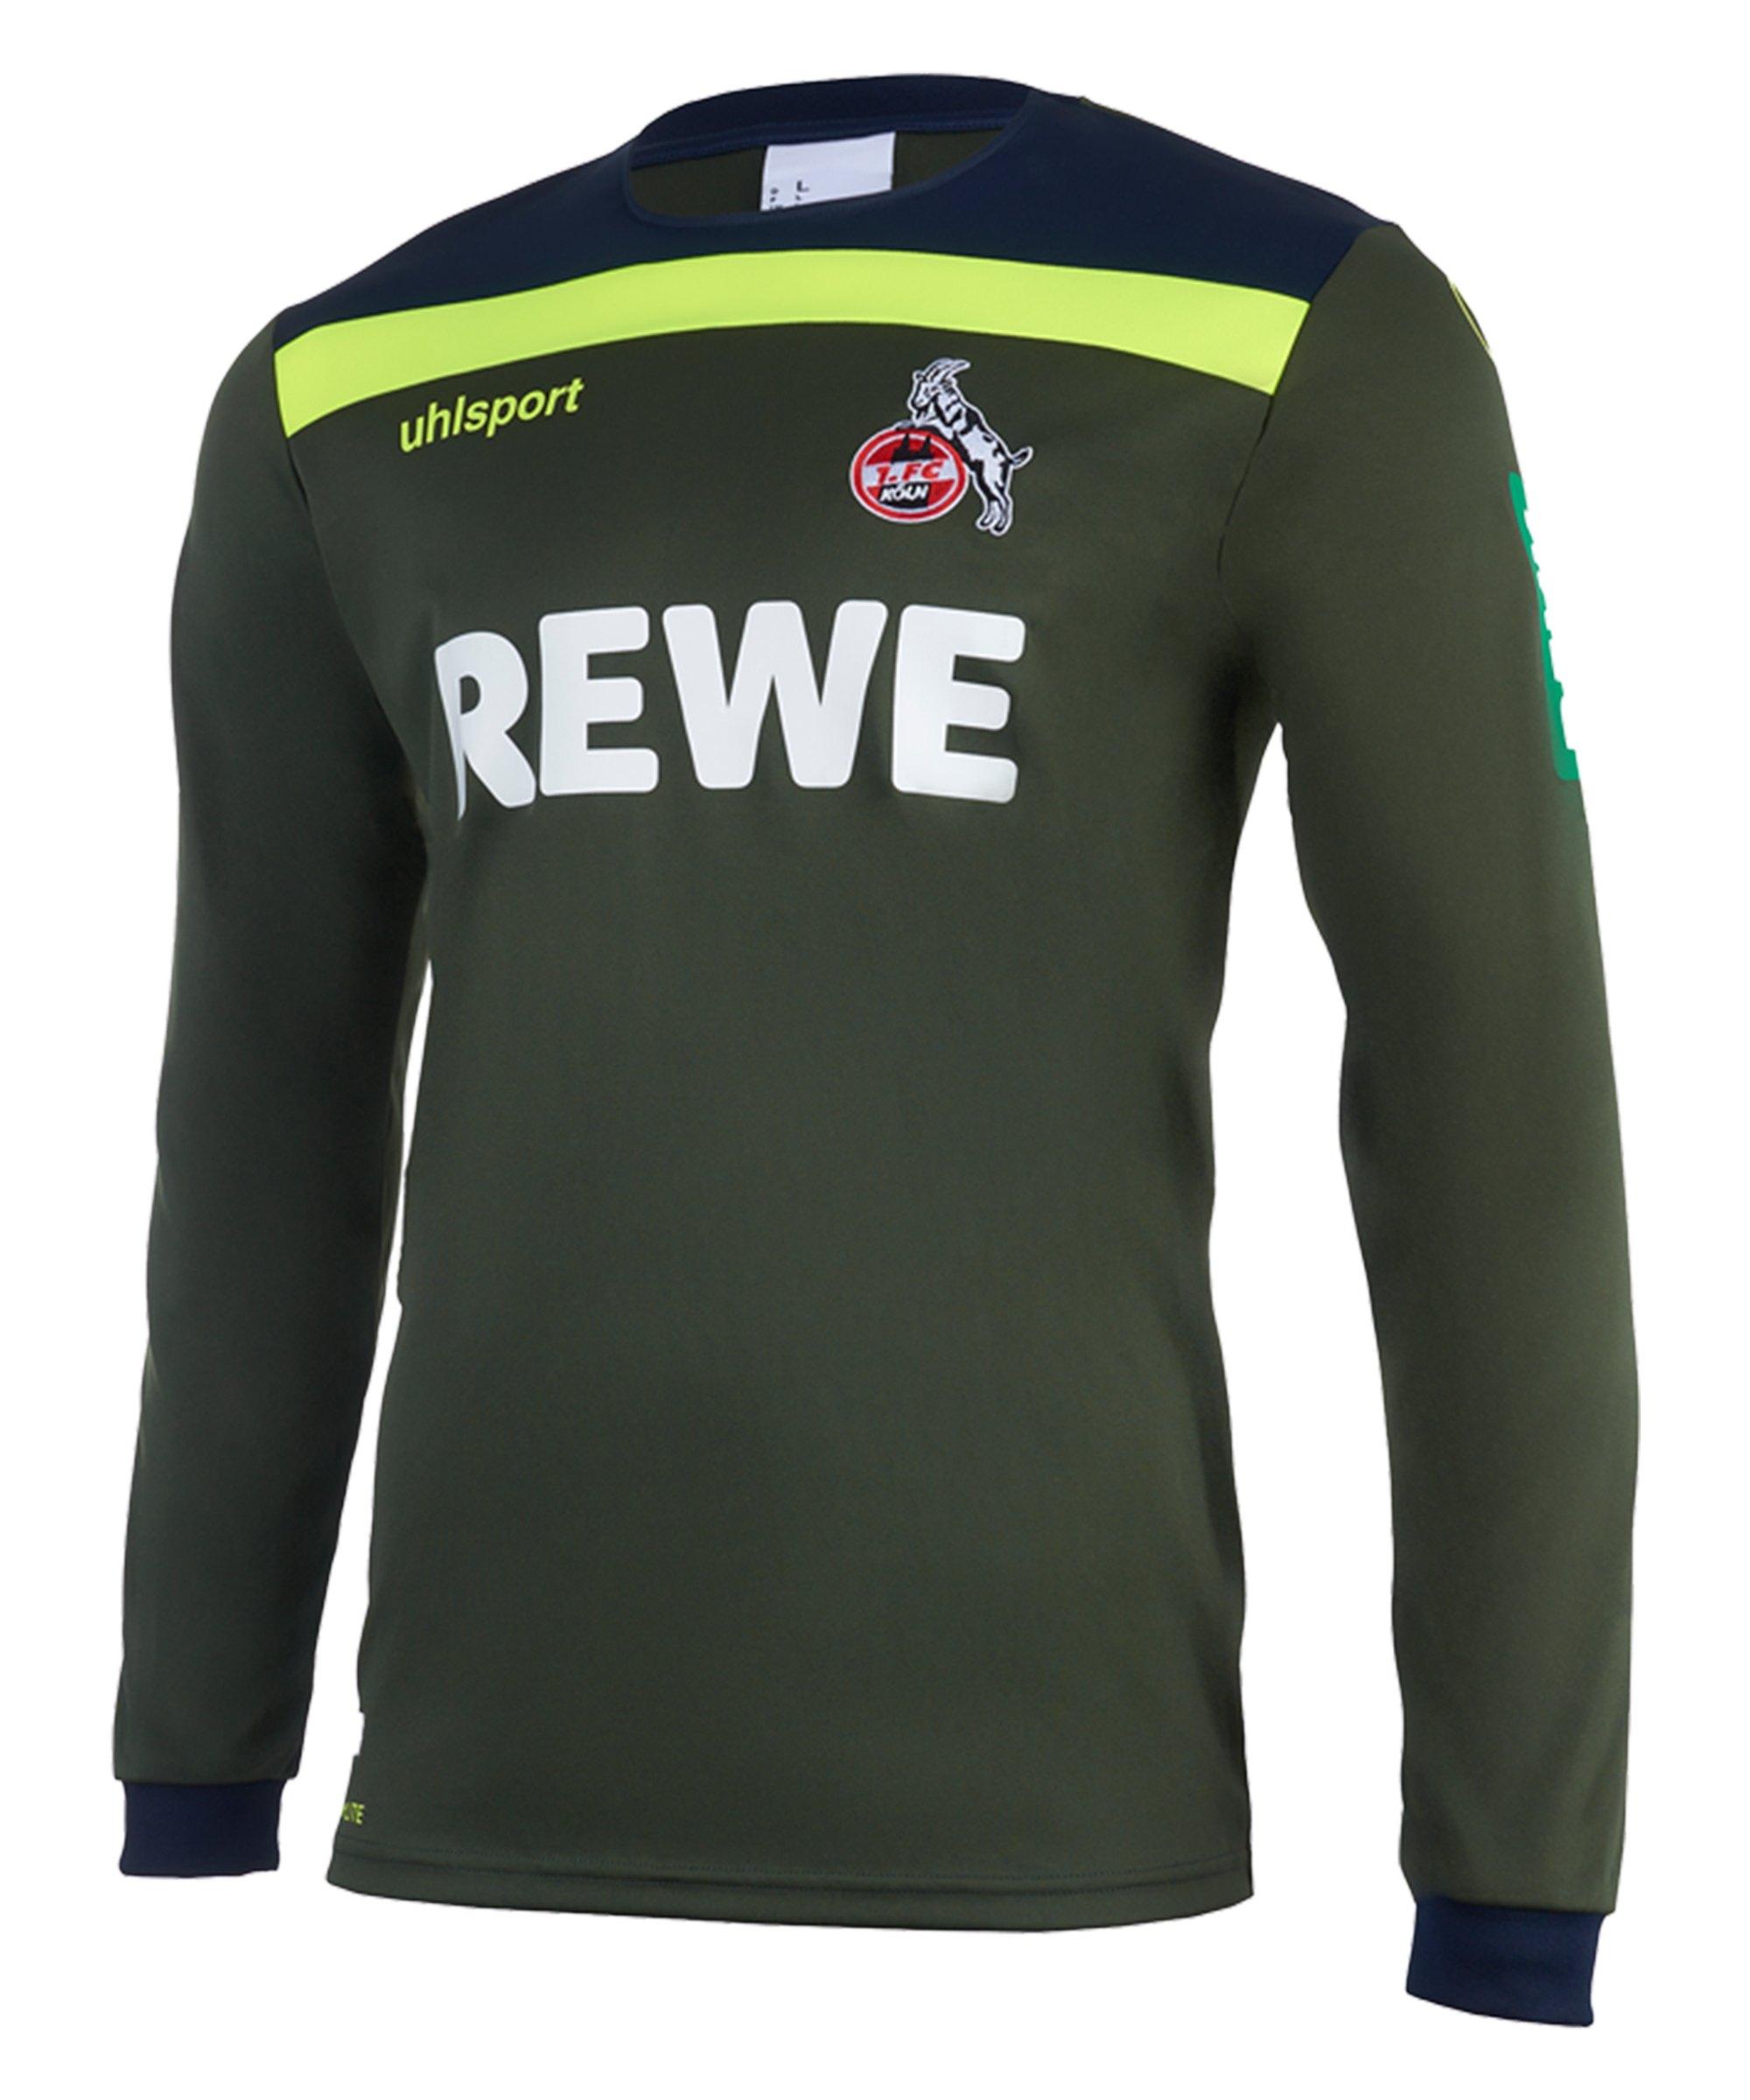 Uhlsport 1. FC Köln TW-Trikot LA 2020/2021 Grün - gruen